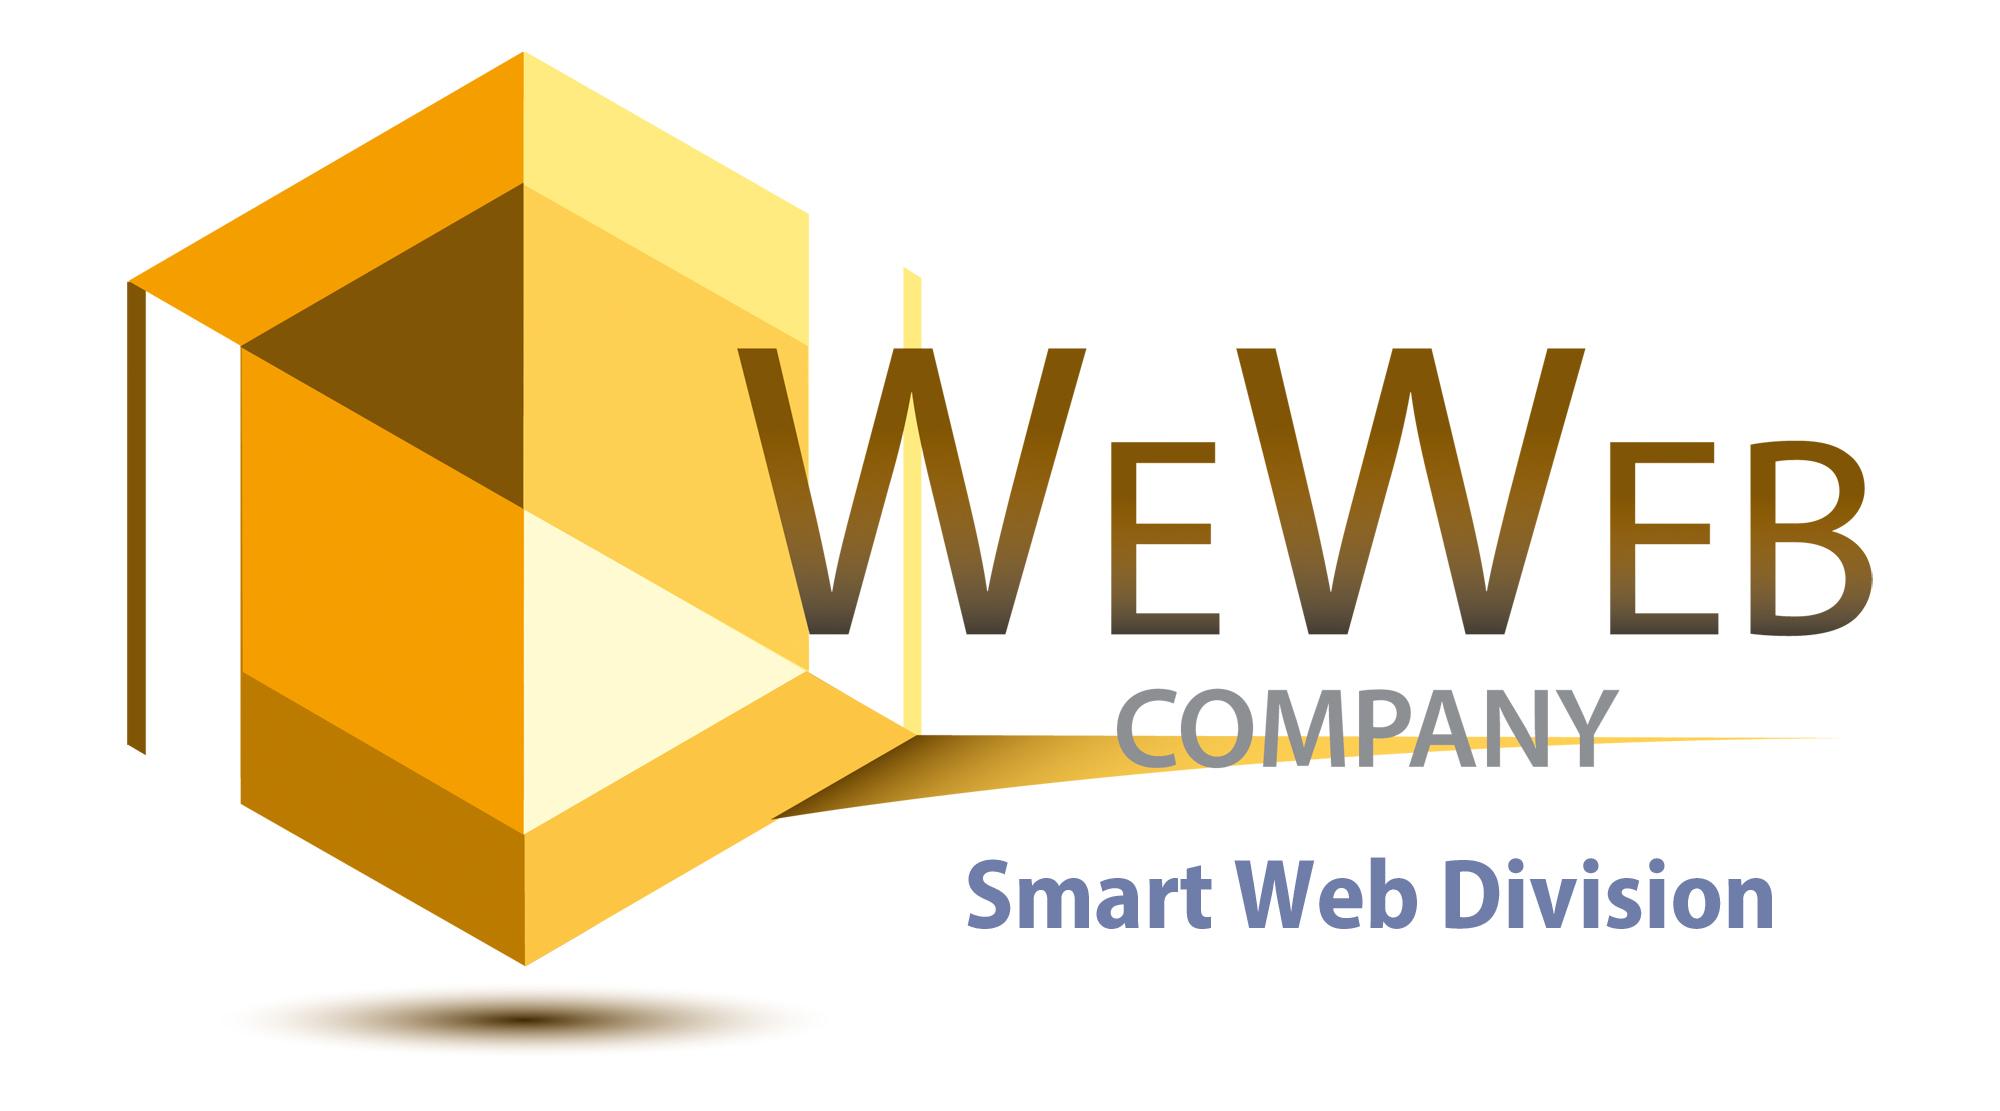 assmart web - we web compnay